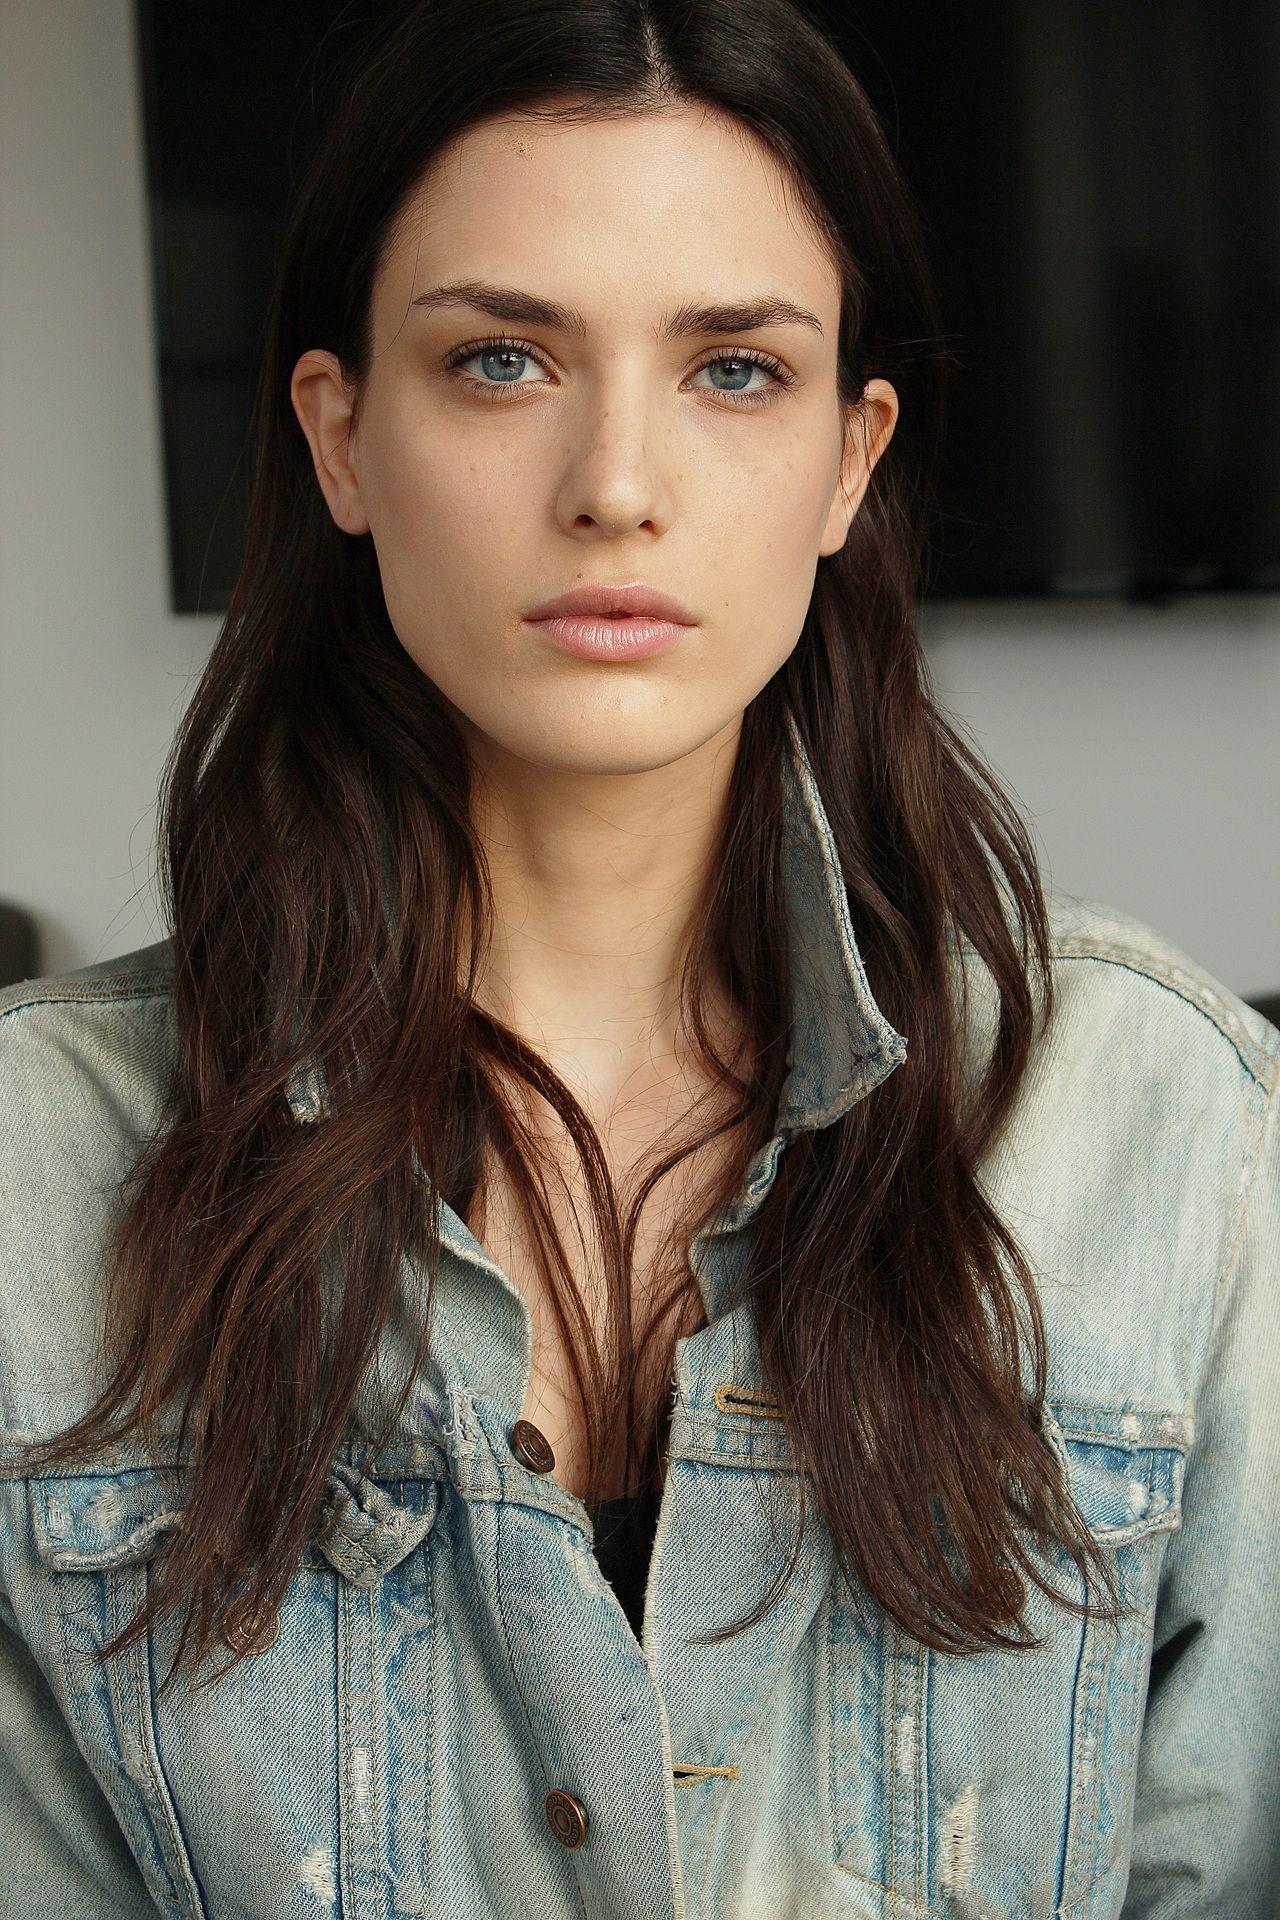 British brunette natalia | XXX pictures)